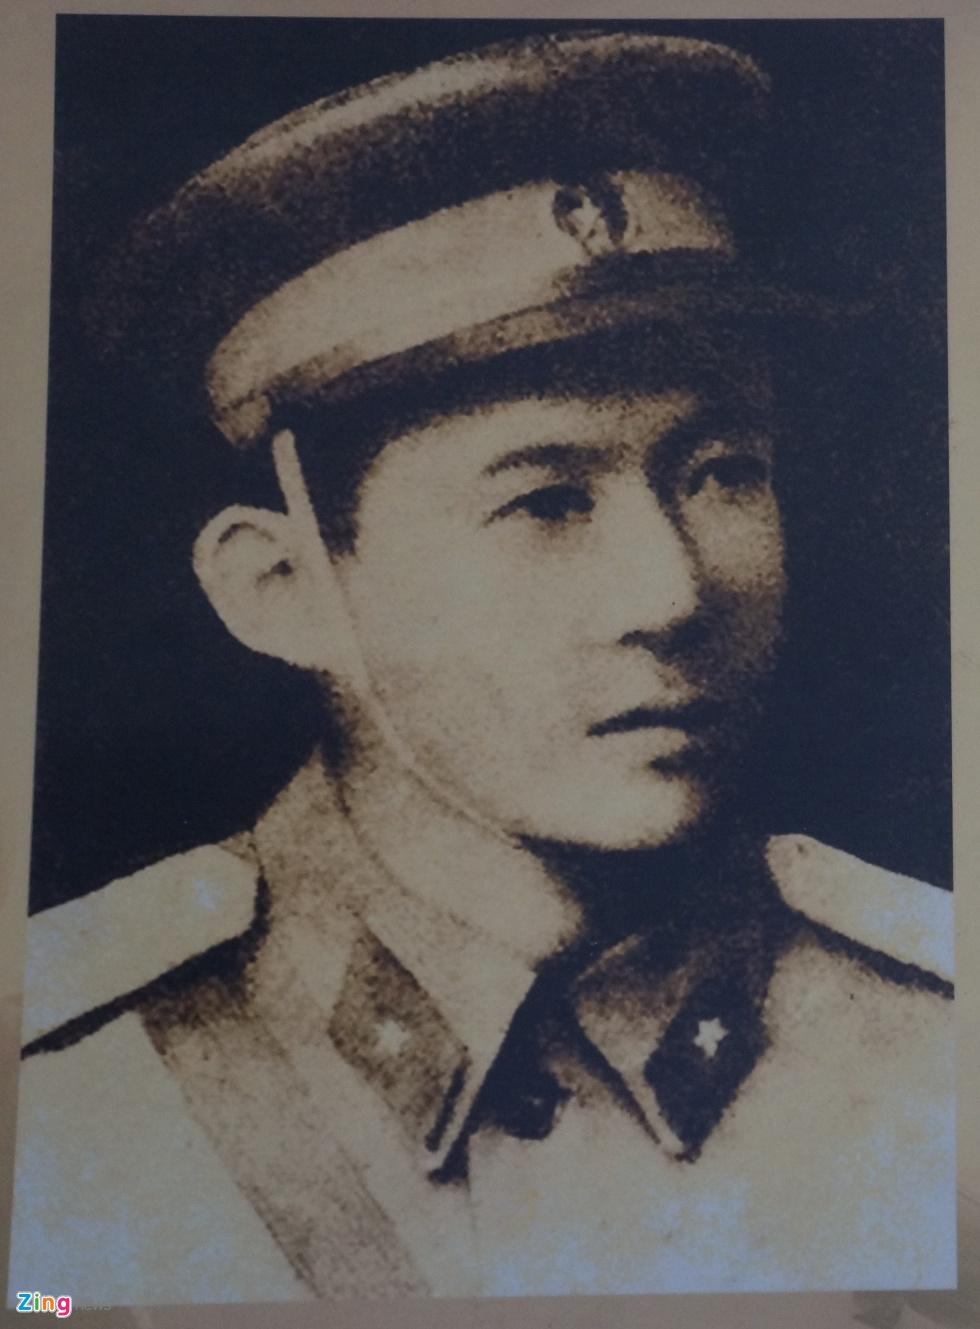 Le Dinh Chinh - nguoi linh dau tien hy sinh o bien gioi phia Bac hinh anh 2